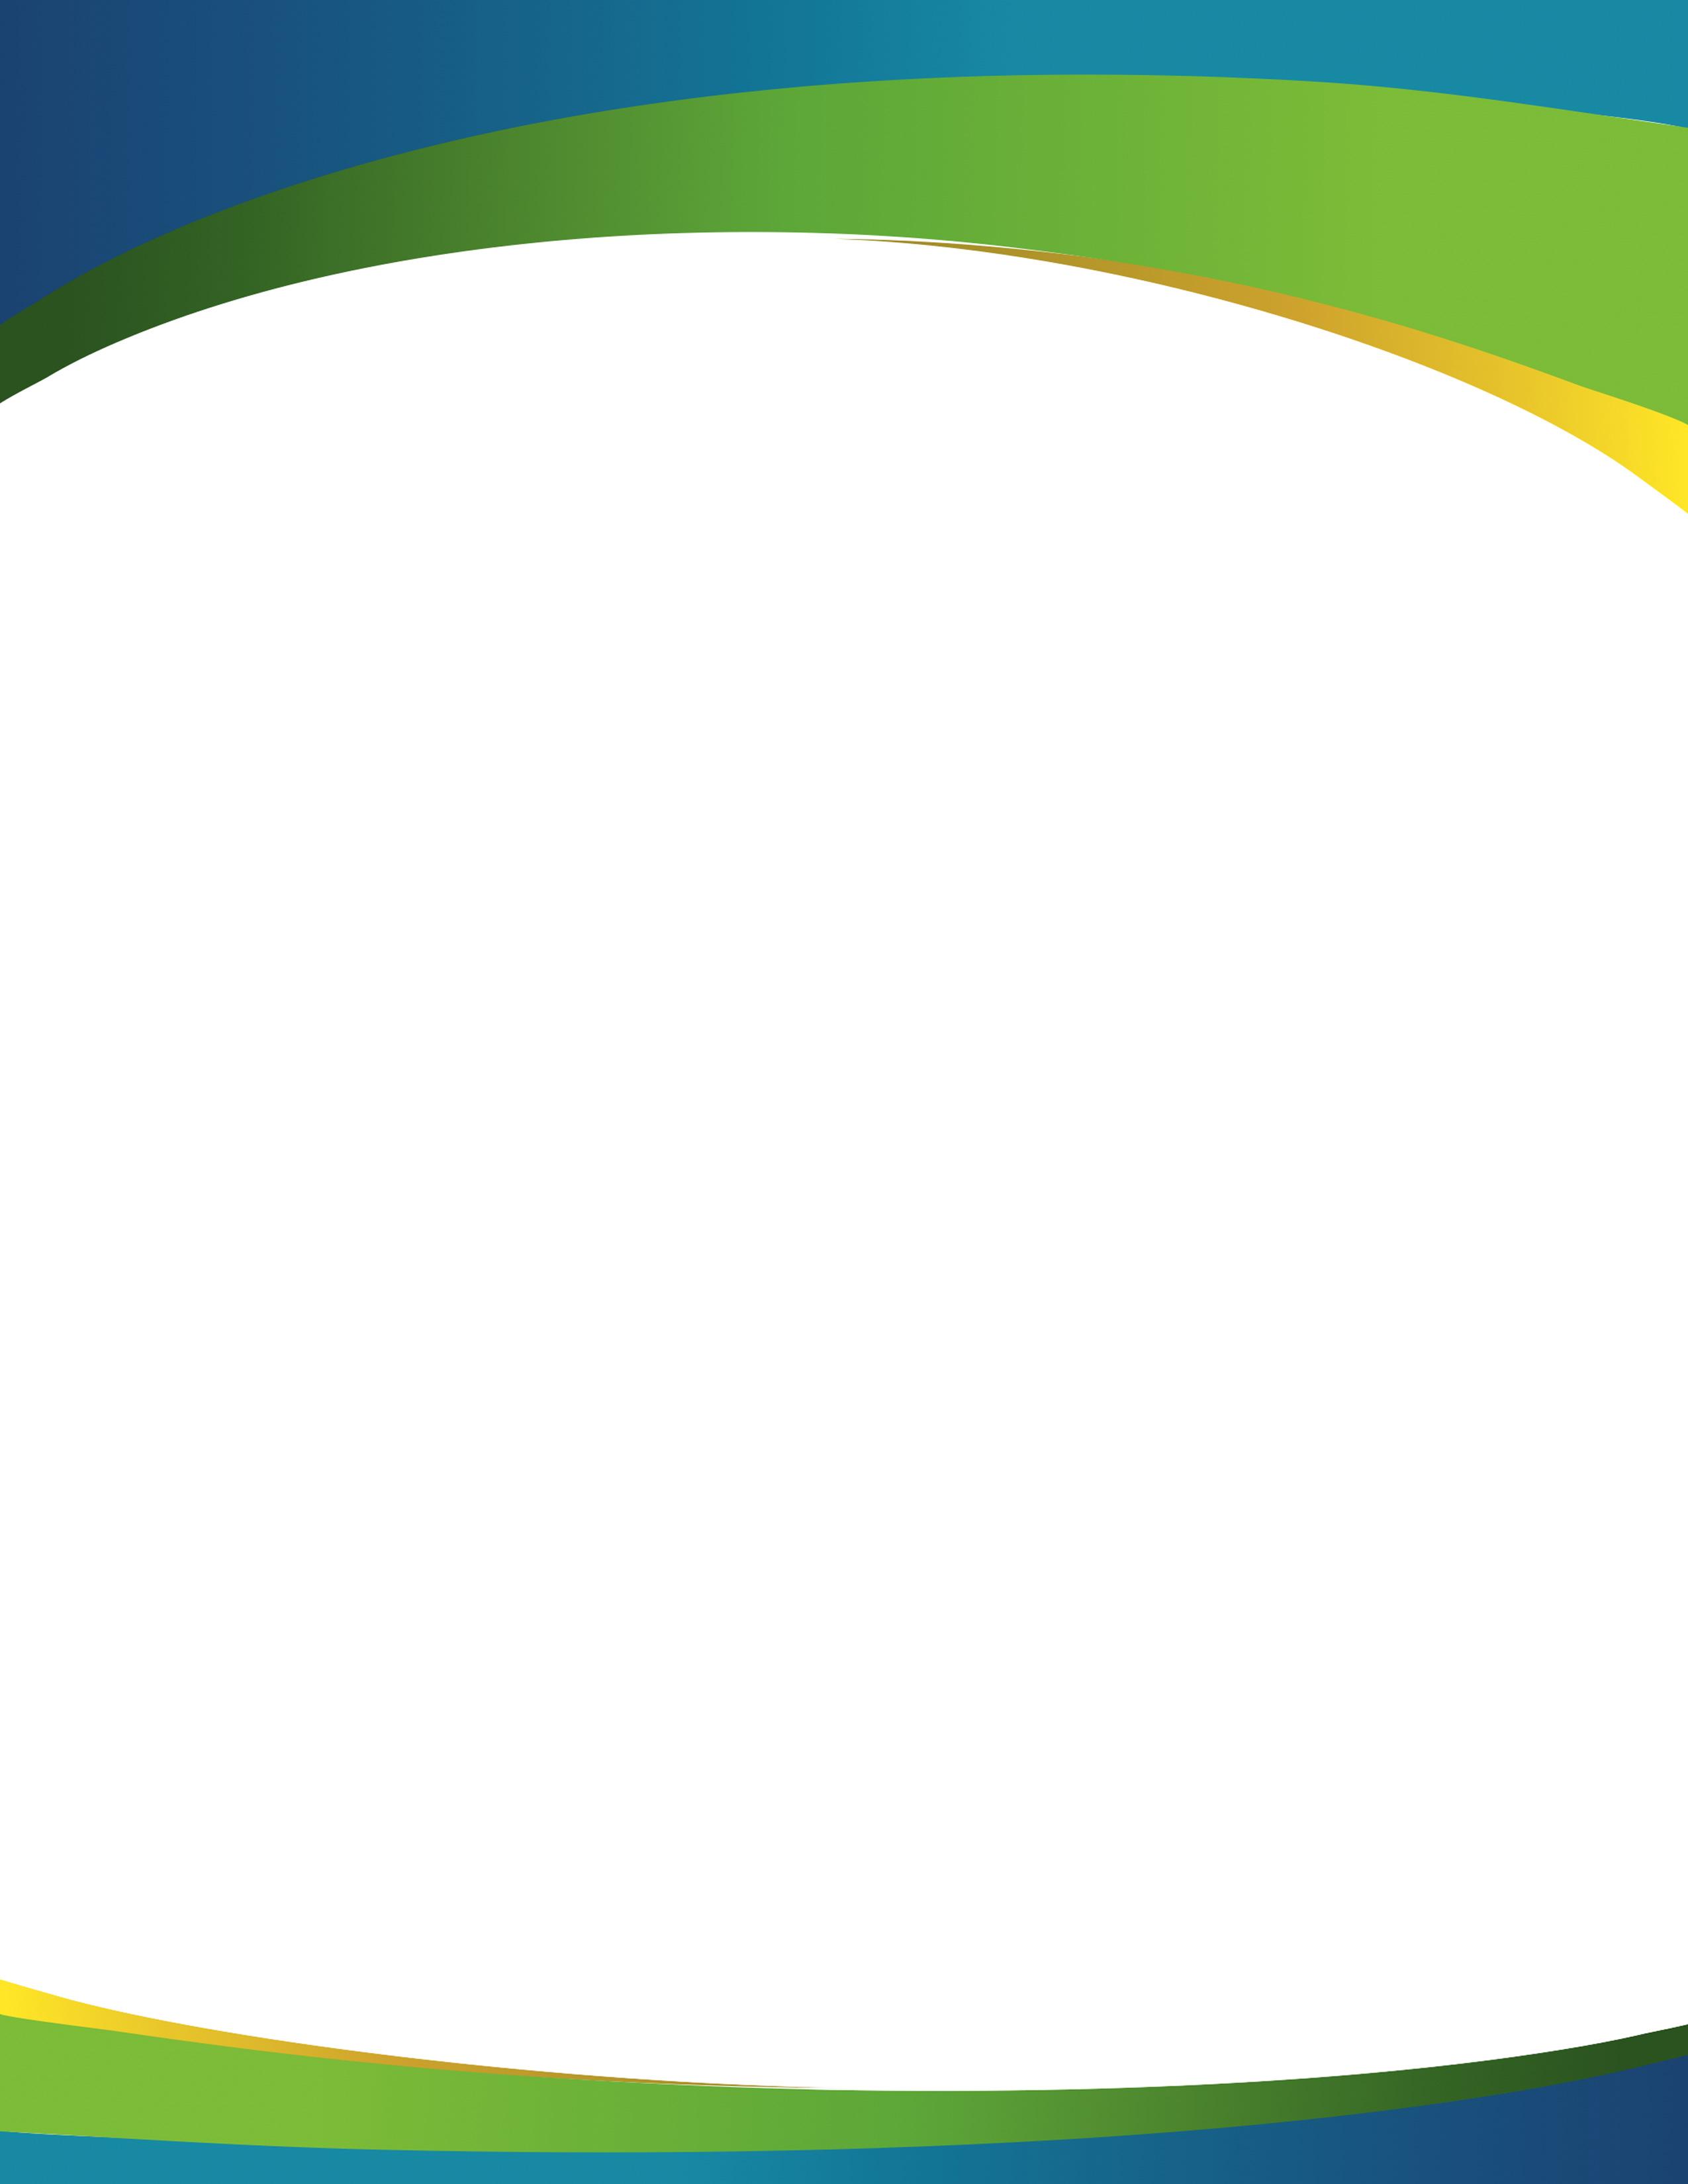 Poster backgrounds design - Green Business Poster Template Design